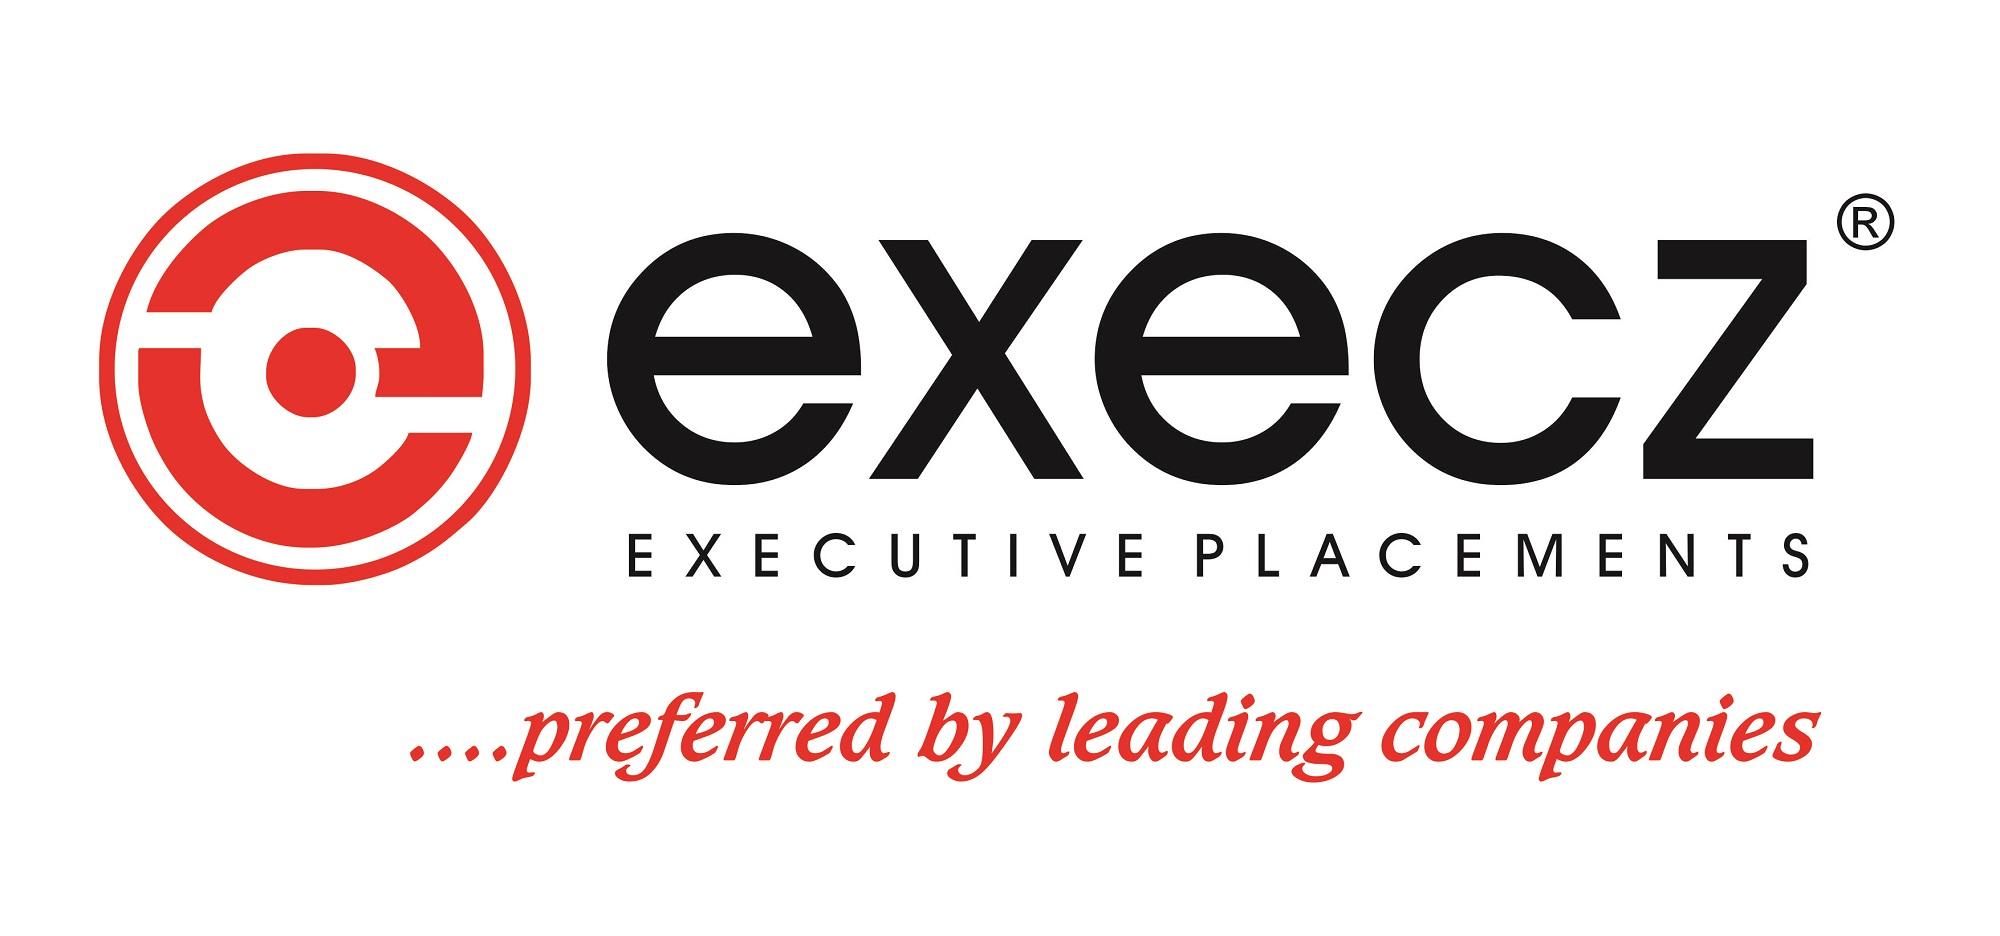 Execz Exeutive Placements®